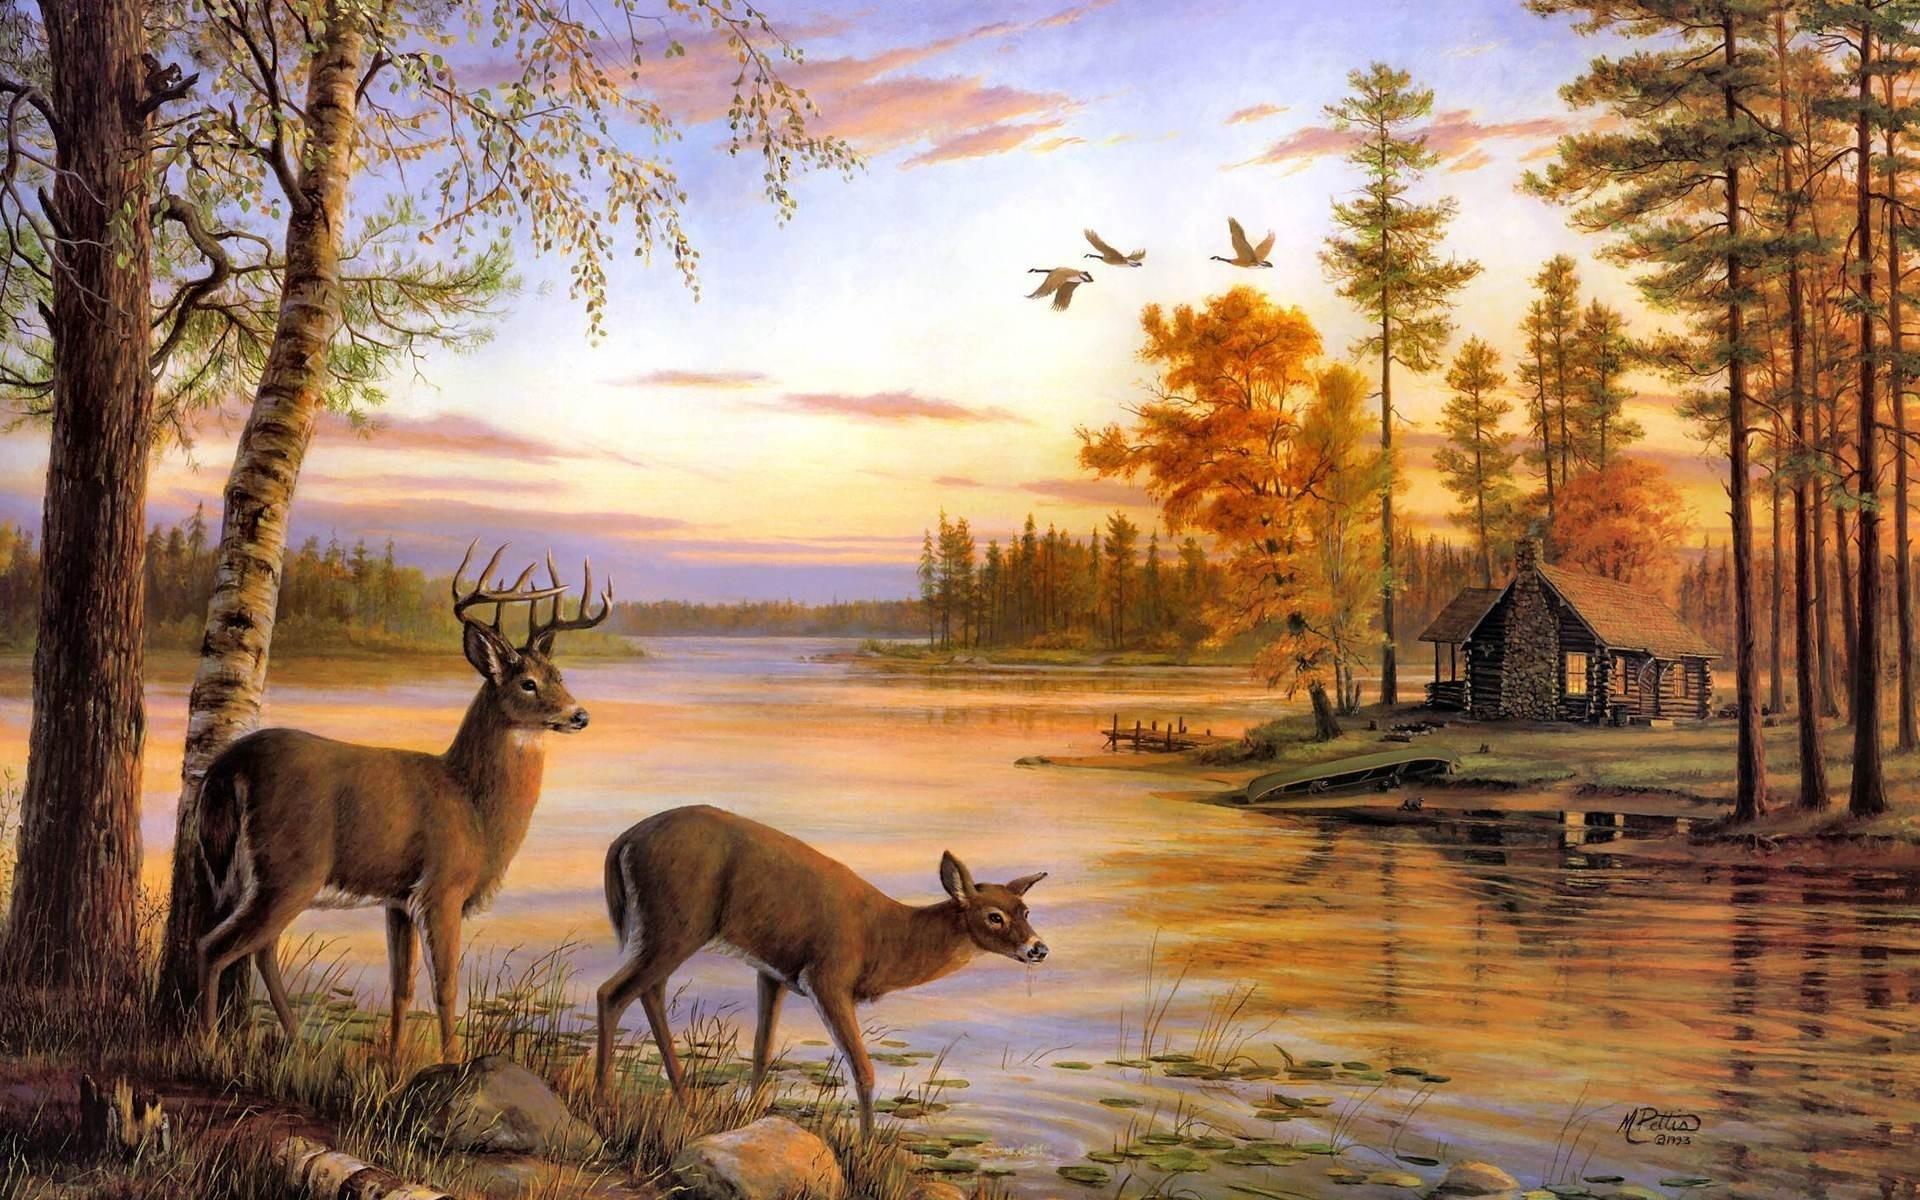 deer artwork cabin lakes 1920x1200 wallpaper High Resolution Wallpaper 1920x1200